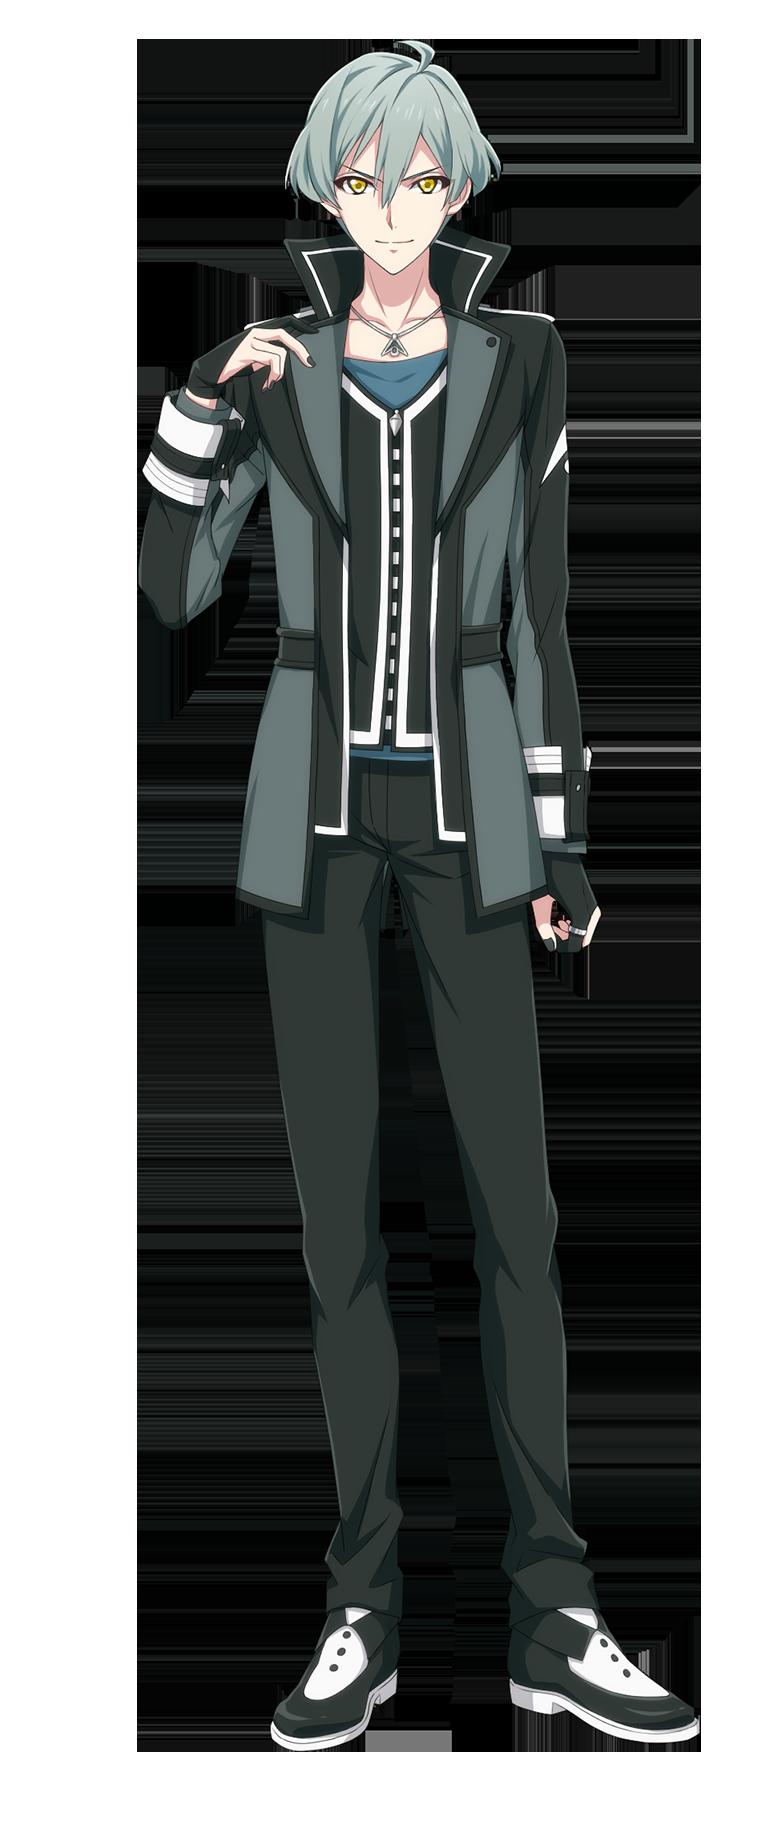 Isumi Haruka (con imágenes)